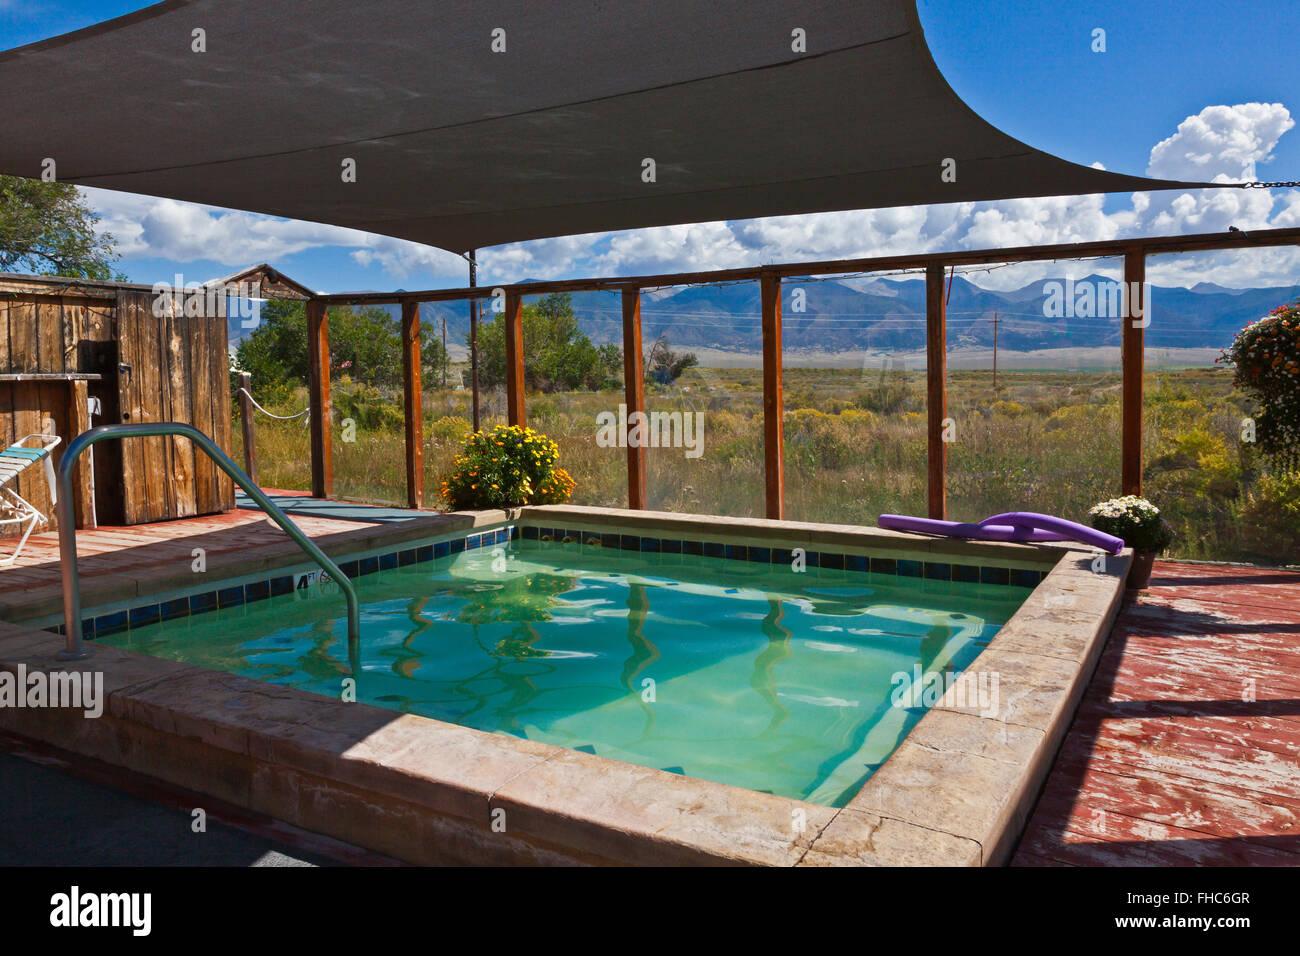 The JOYFUL JOURNEYS HOT SPRINGS - MOFFAT COLORADO - Stock Image